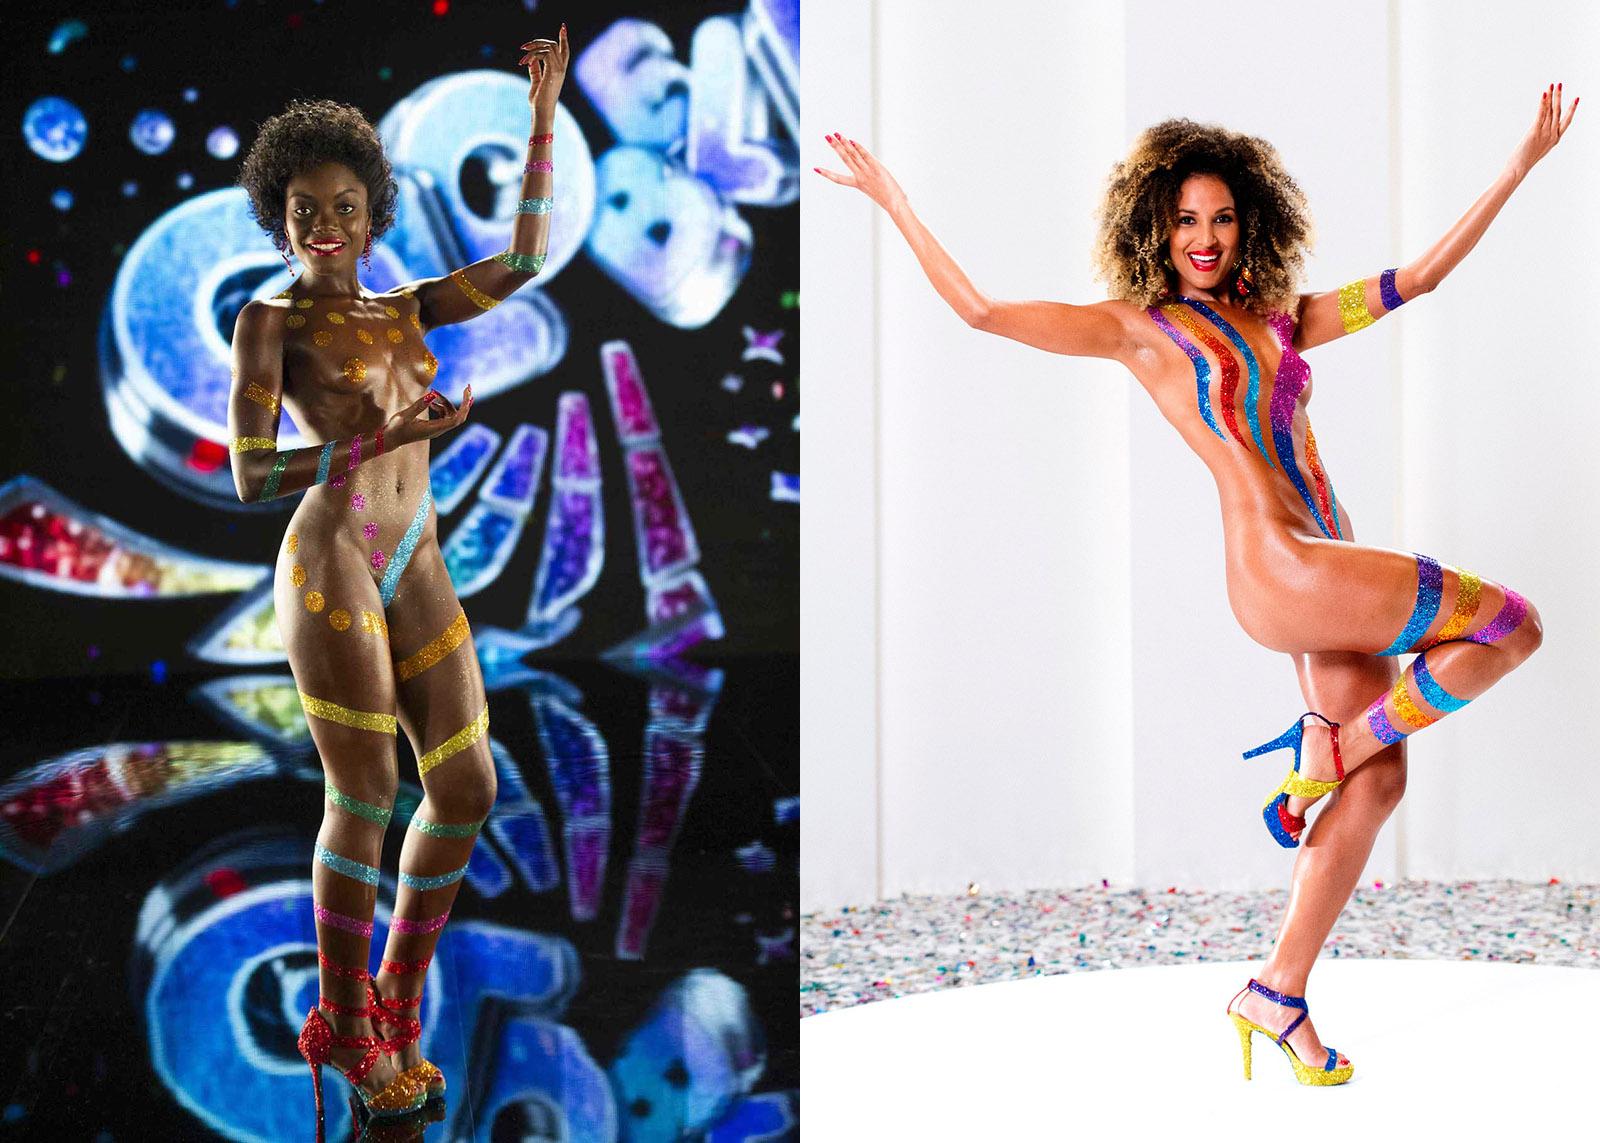 brazil-griot-mag-Gabriel Hilair and Dúdús fight racism and homophobia through fashion and art_nayara-justino-erika-moura-globeleza